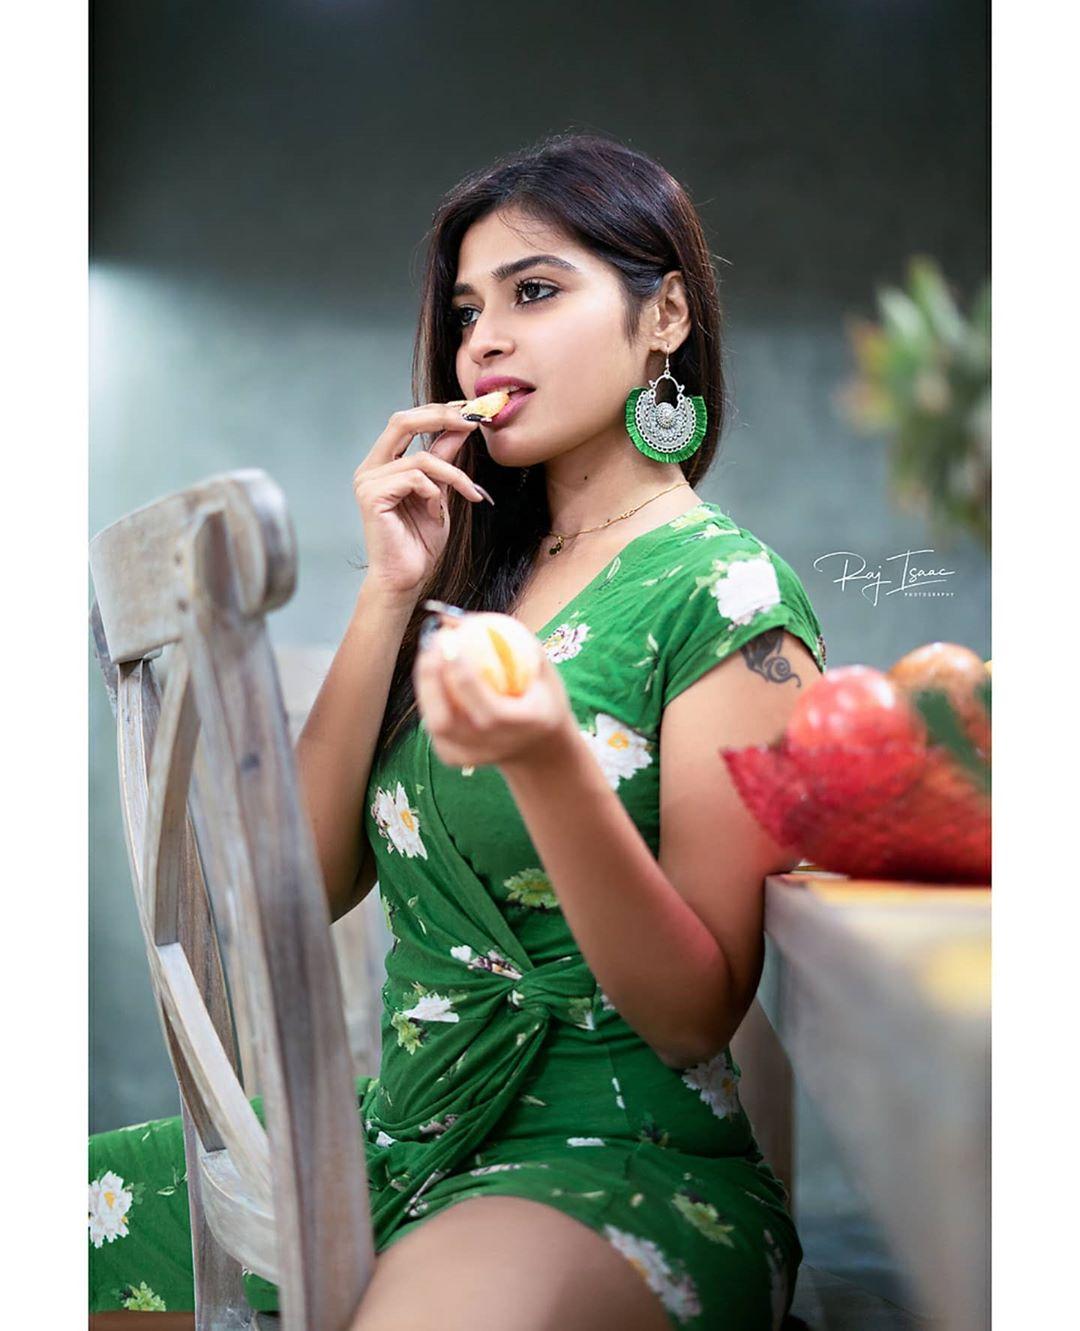 Photo of Dharsha Gupta in Green Dress